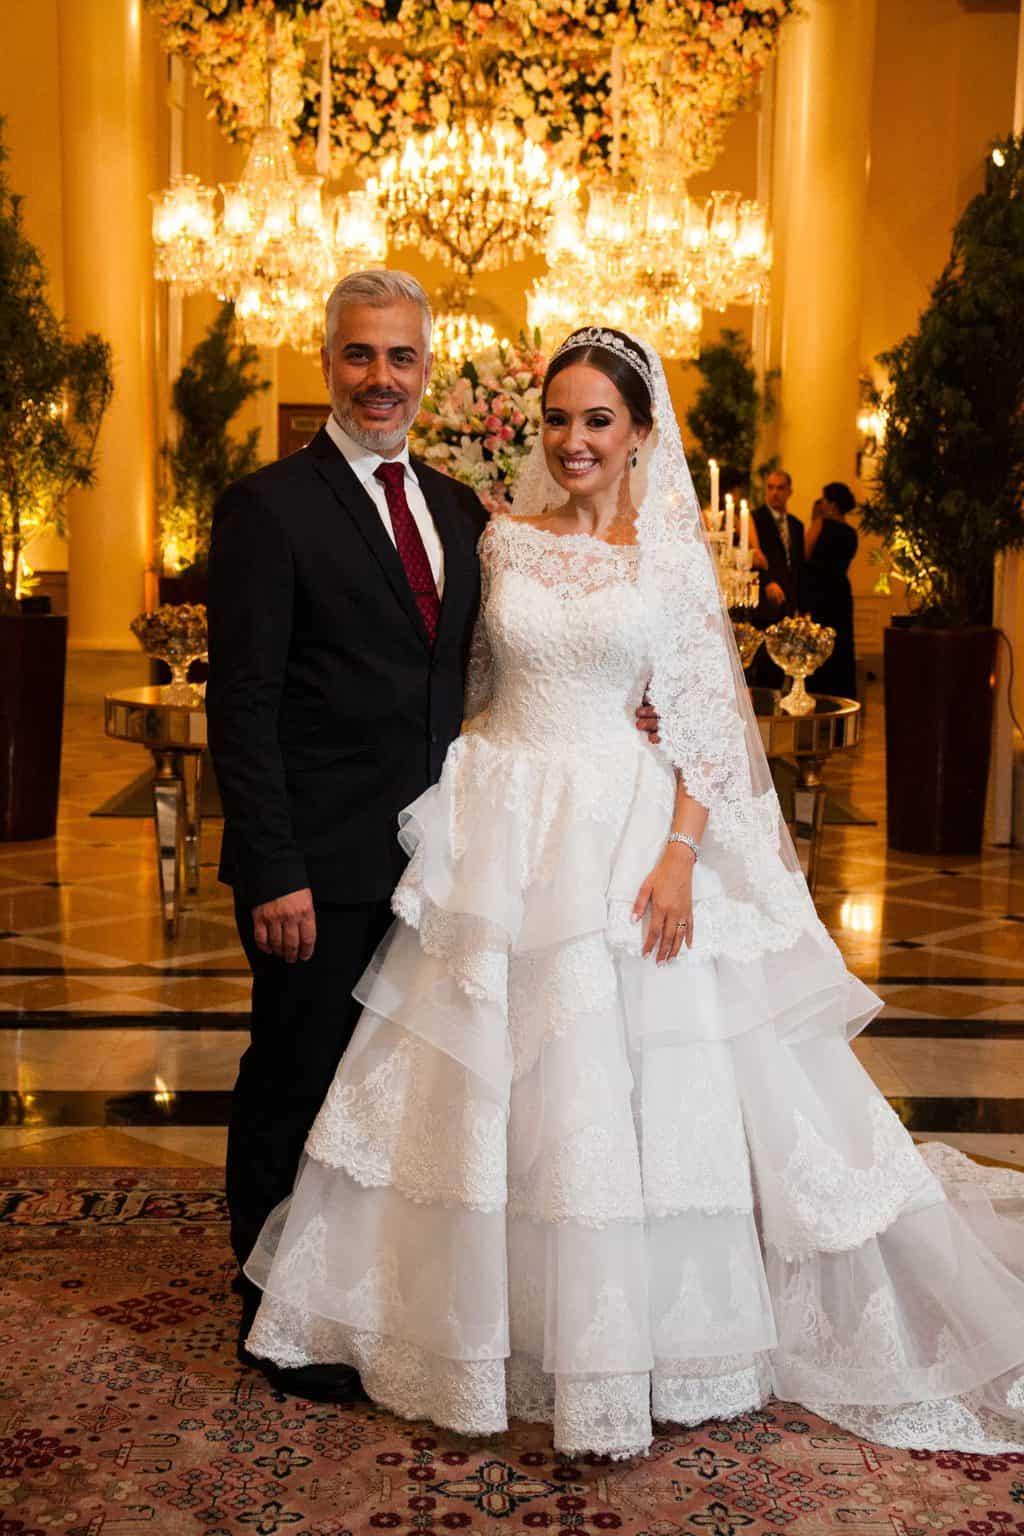 Casamento-Clássico-Casamento-tradicional-Copacabana-Palace-Monica-Roias-Ribas-Foto-e-Vídeo-Tuanny-e-Bernardo-CaseMe-4